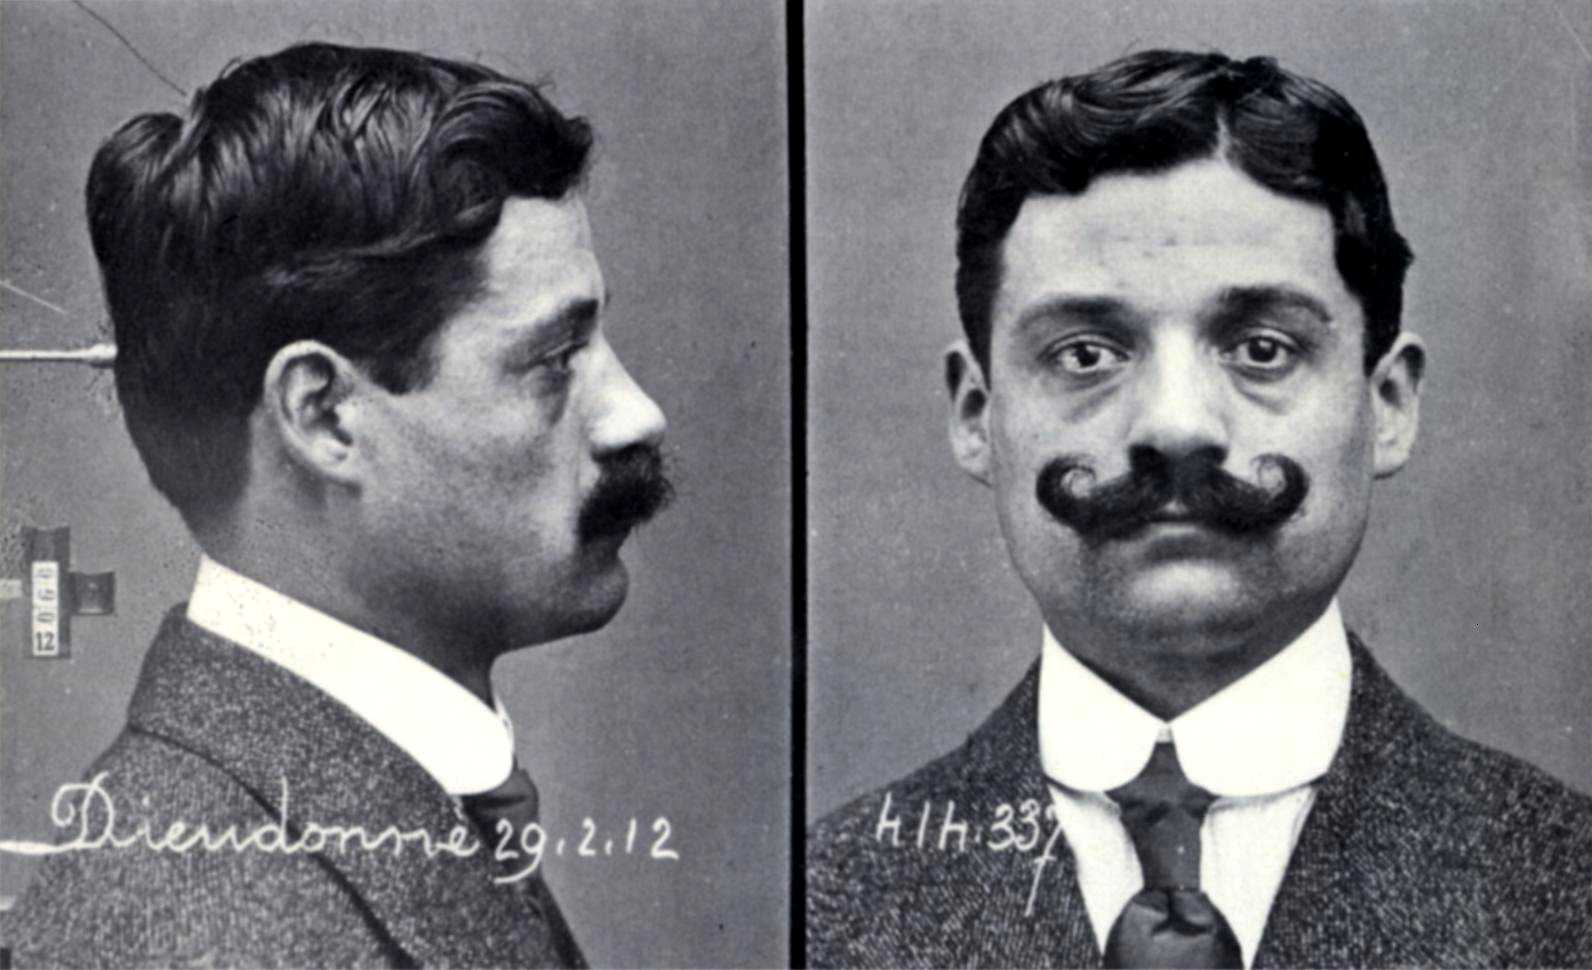 Fitxa policíaca d'Eugène Dieudonné